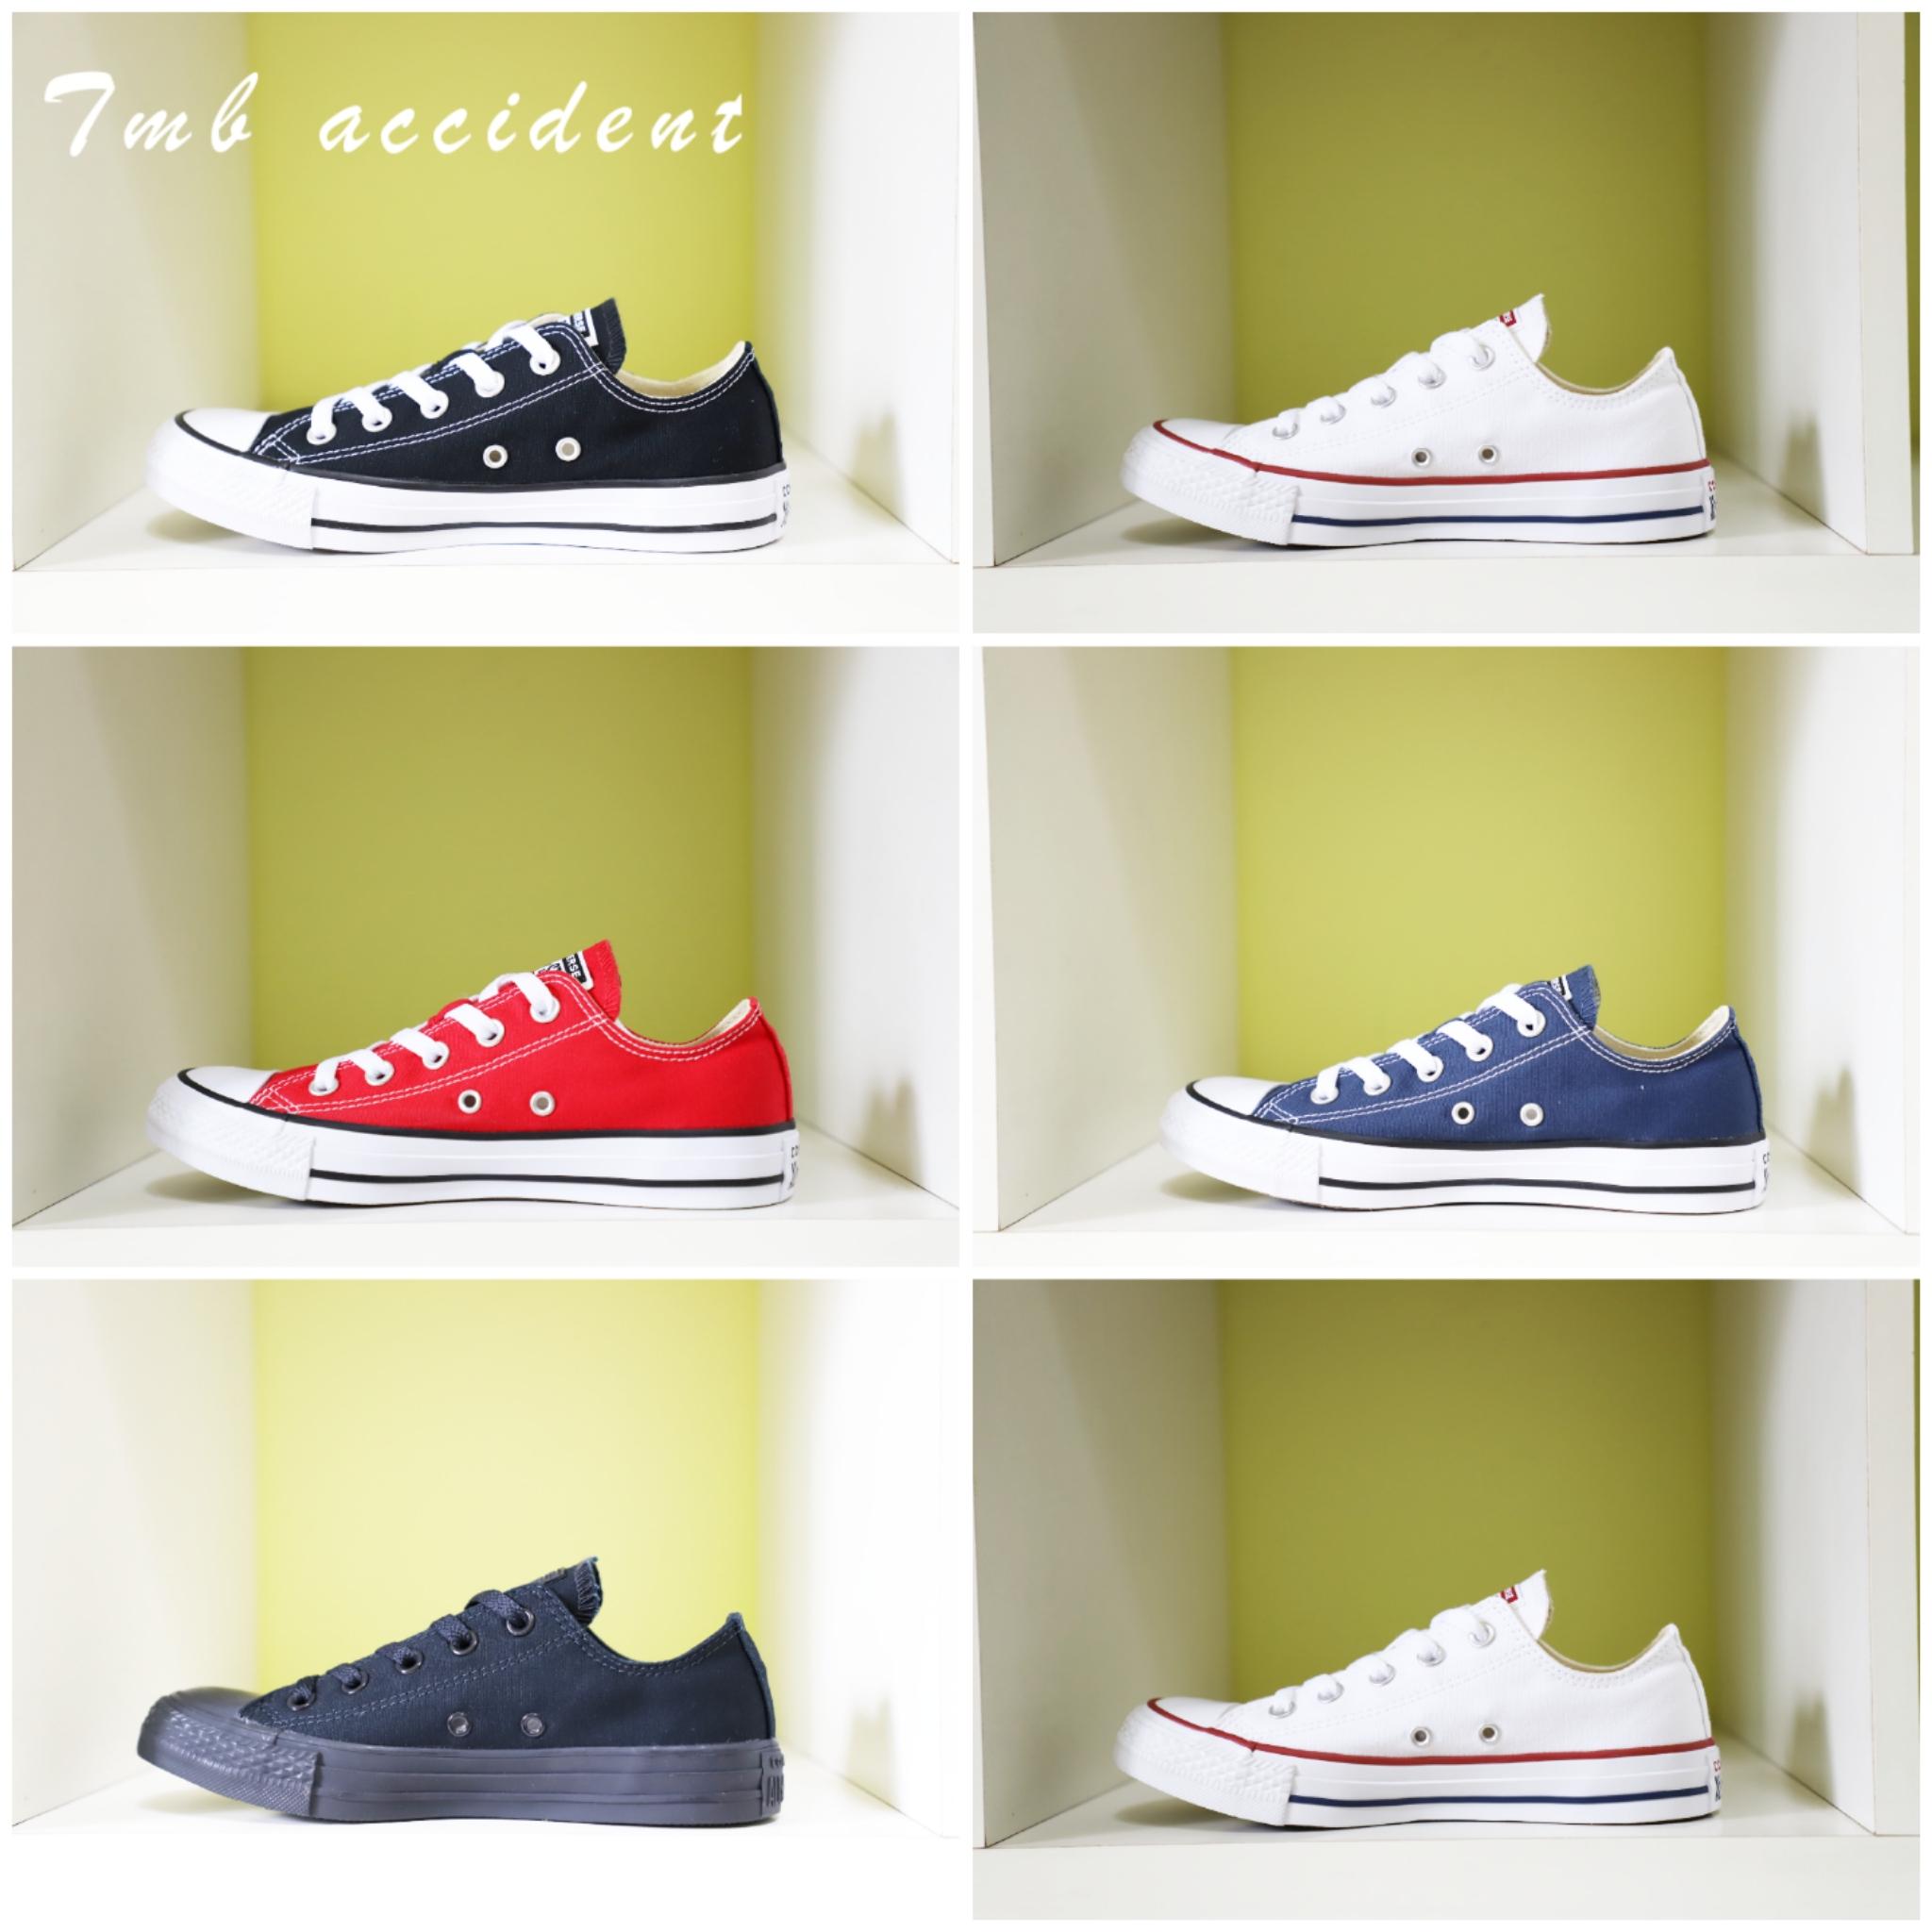 CONVERSE匡威 经典常青款黑色白色低帮男鞋女鞋情侣帆布鞋101001